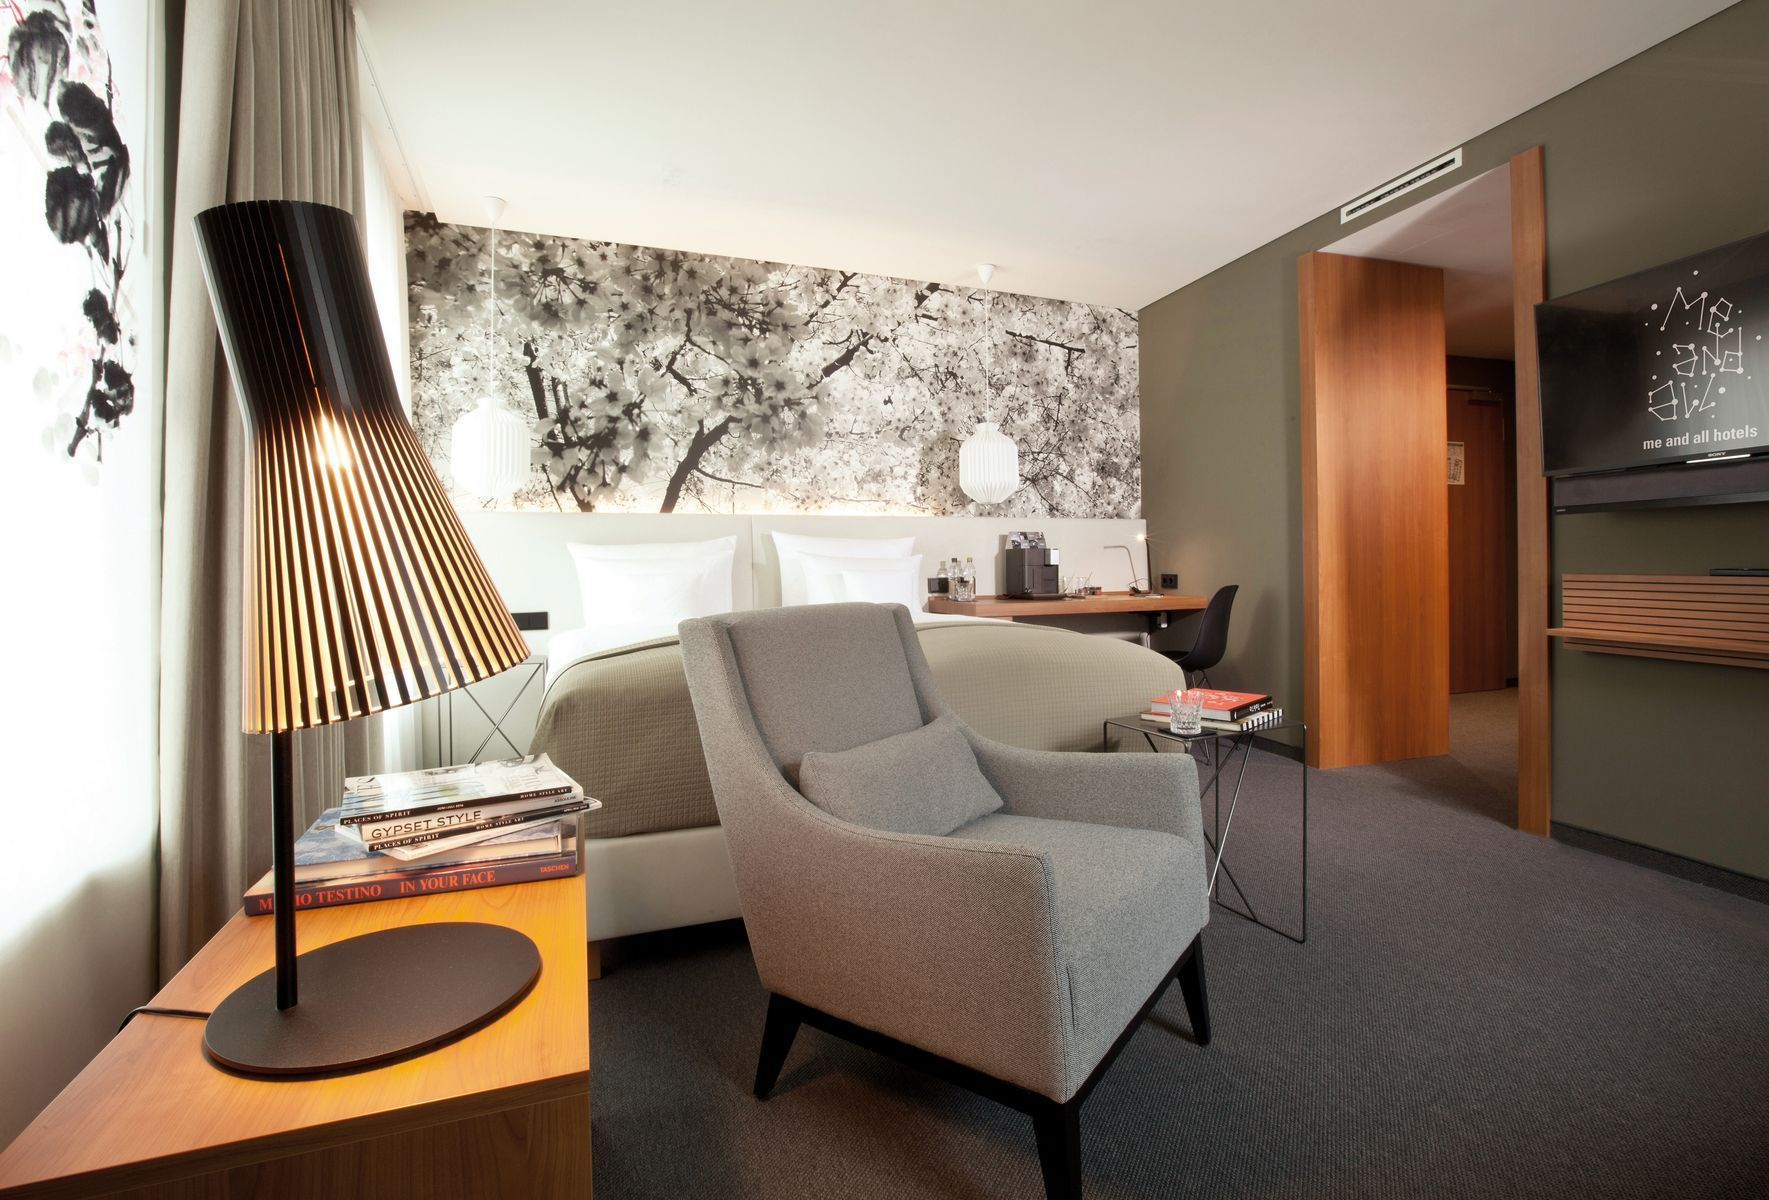 hotelzimmer düsseldorf  me and all hotel düsseldorf